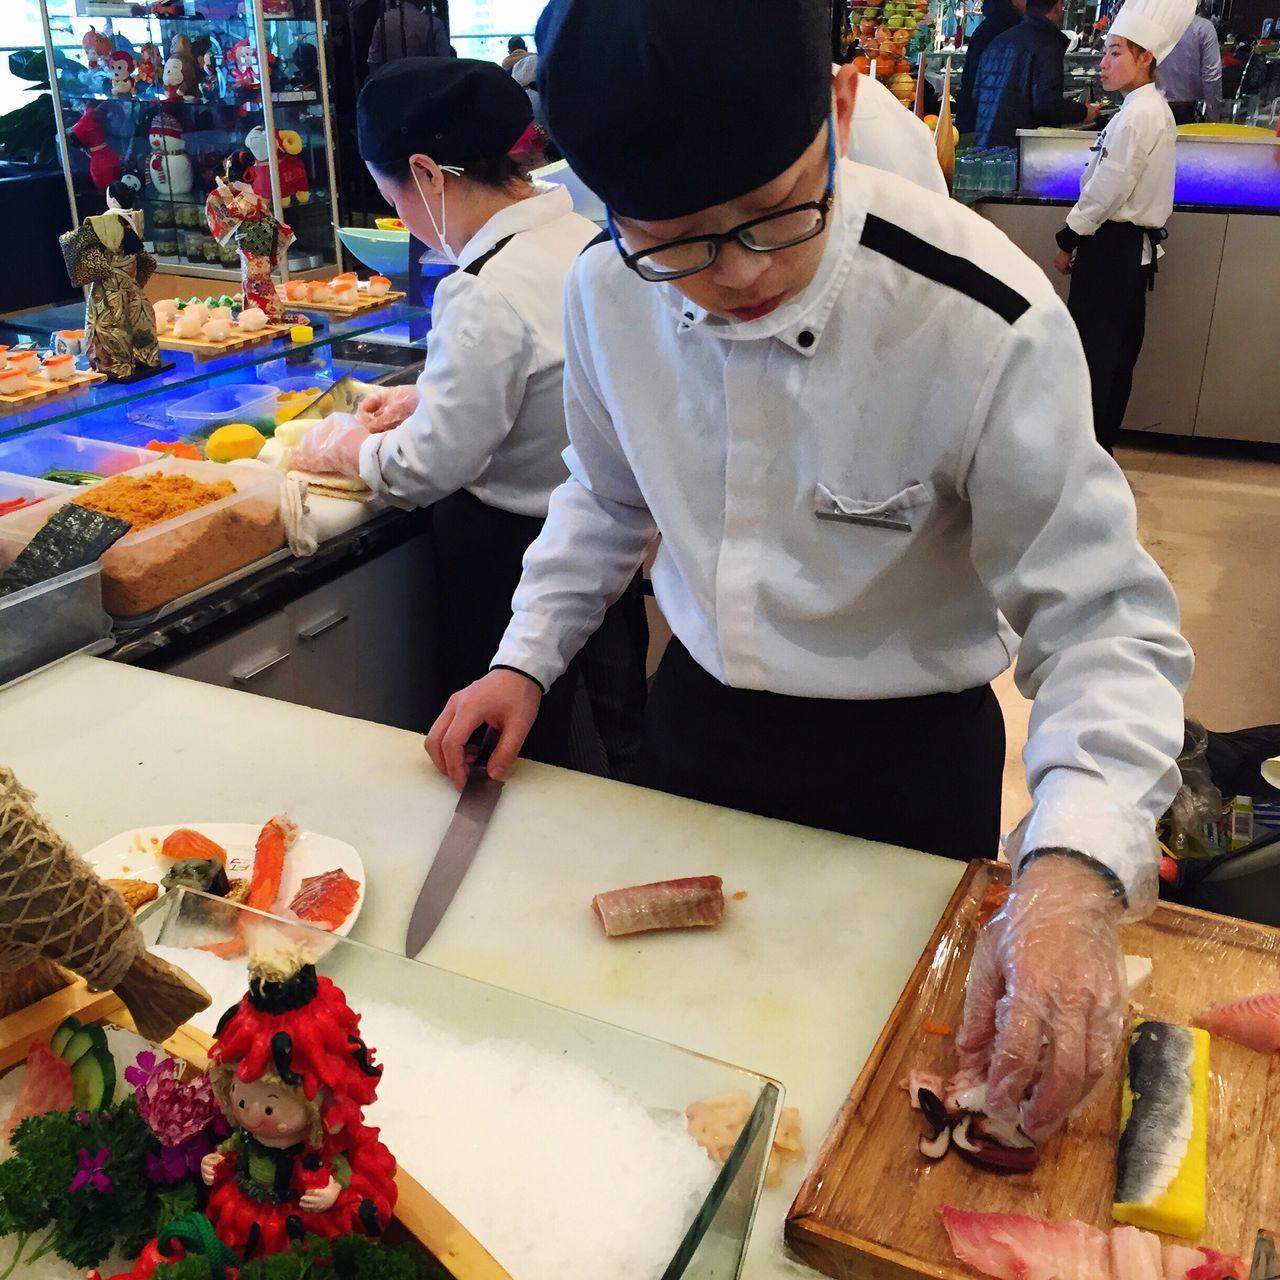 料理 生鱼片 自助餐 酒店 烟台 山东 Cooking Fish Buffet Hotel Yantai China Japanese Food 日式料理